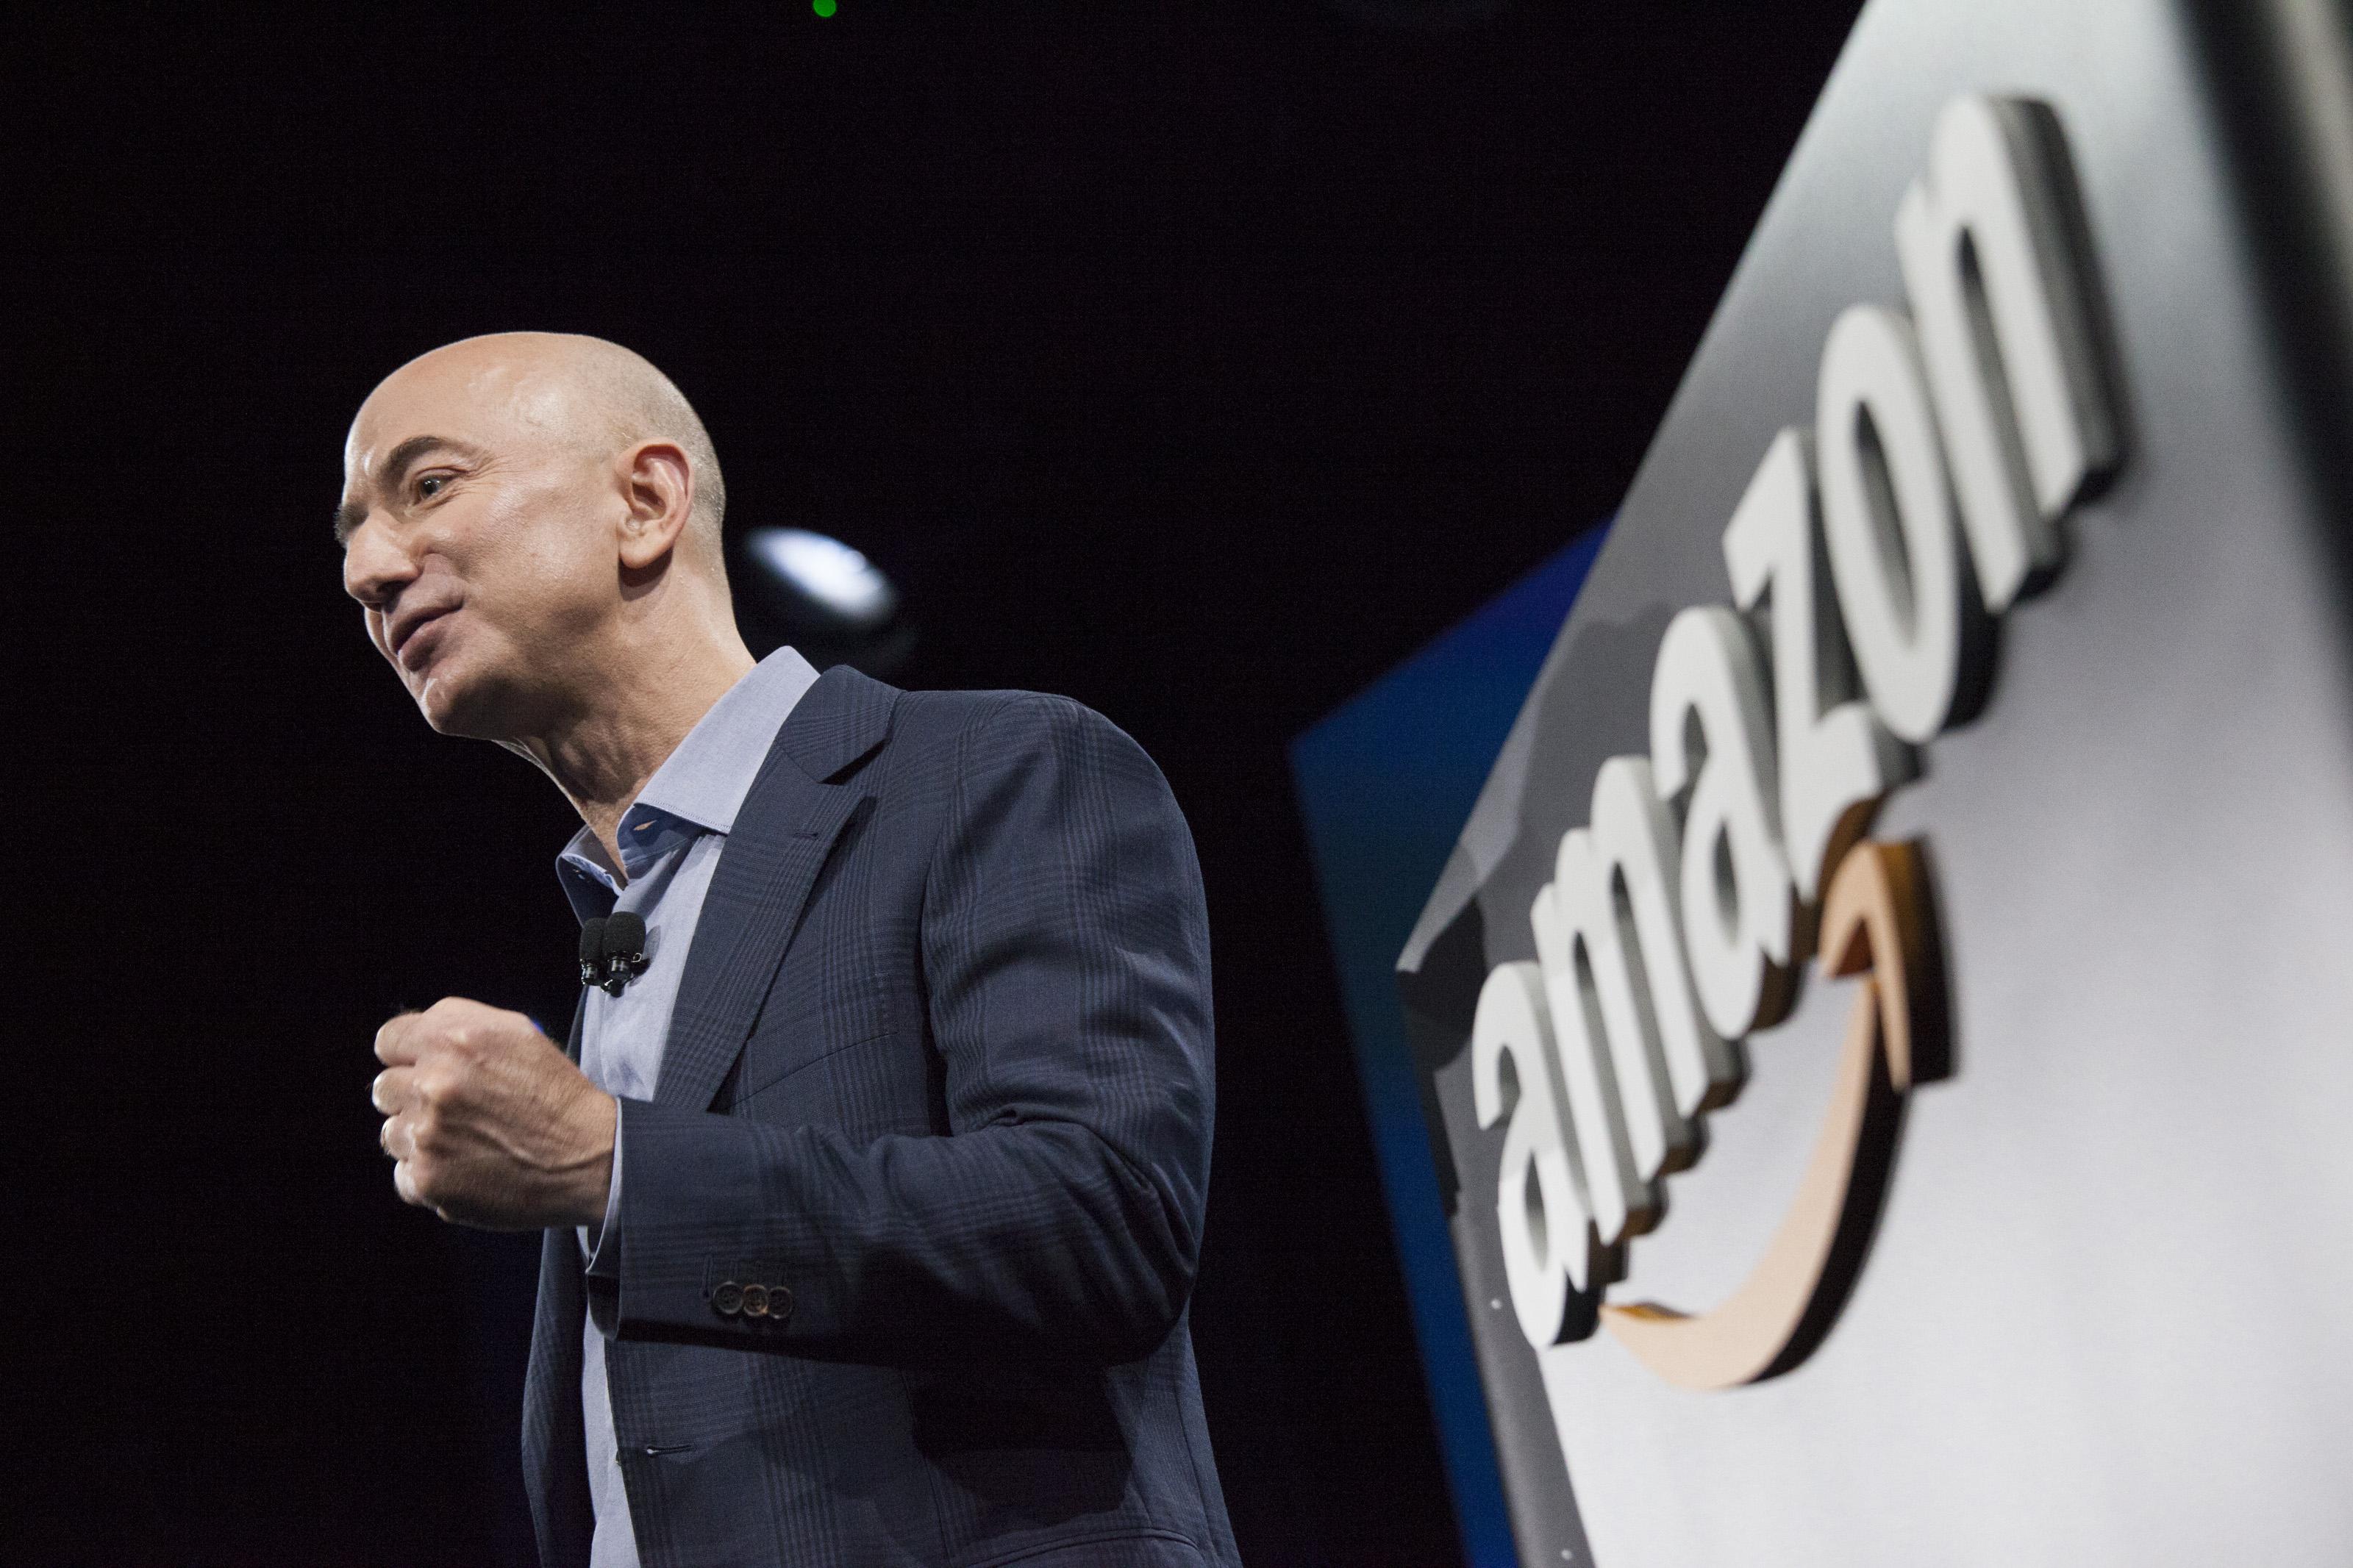 Jeff Bezos Is the World's Richest Man